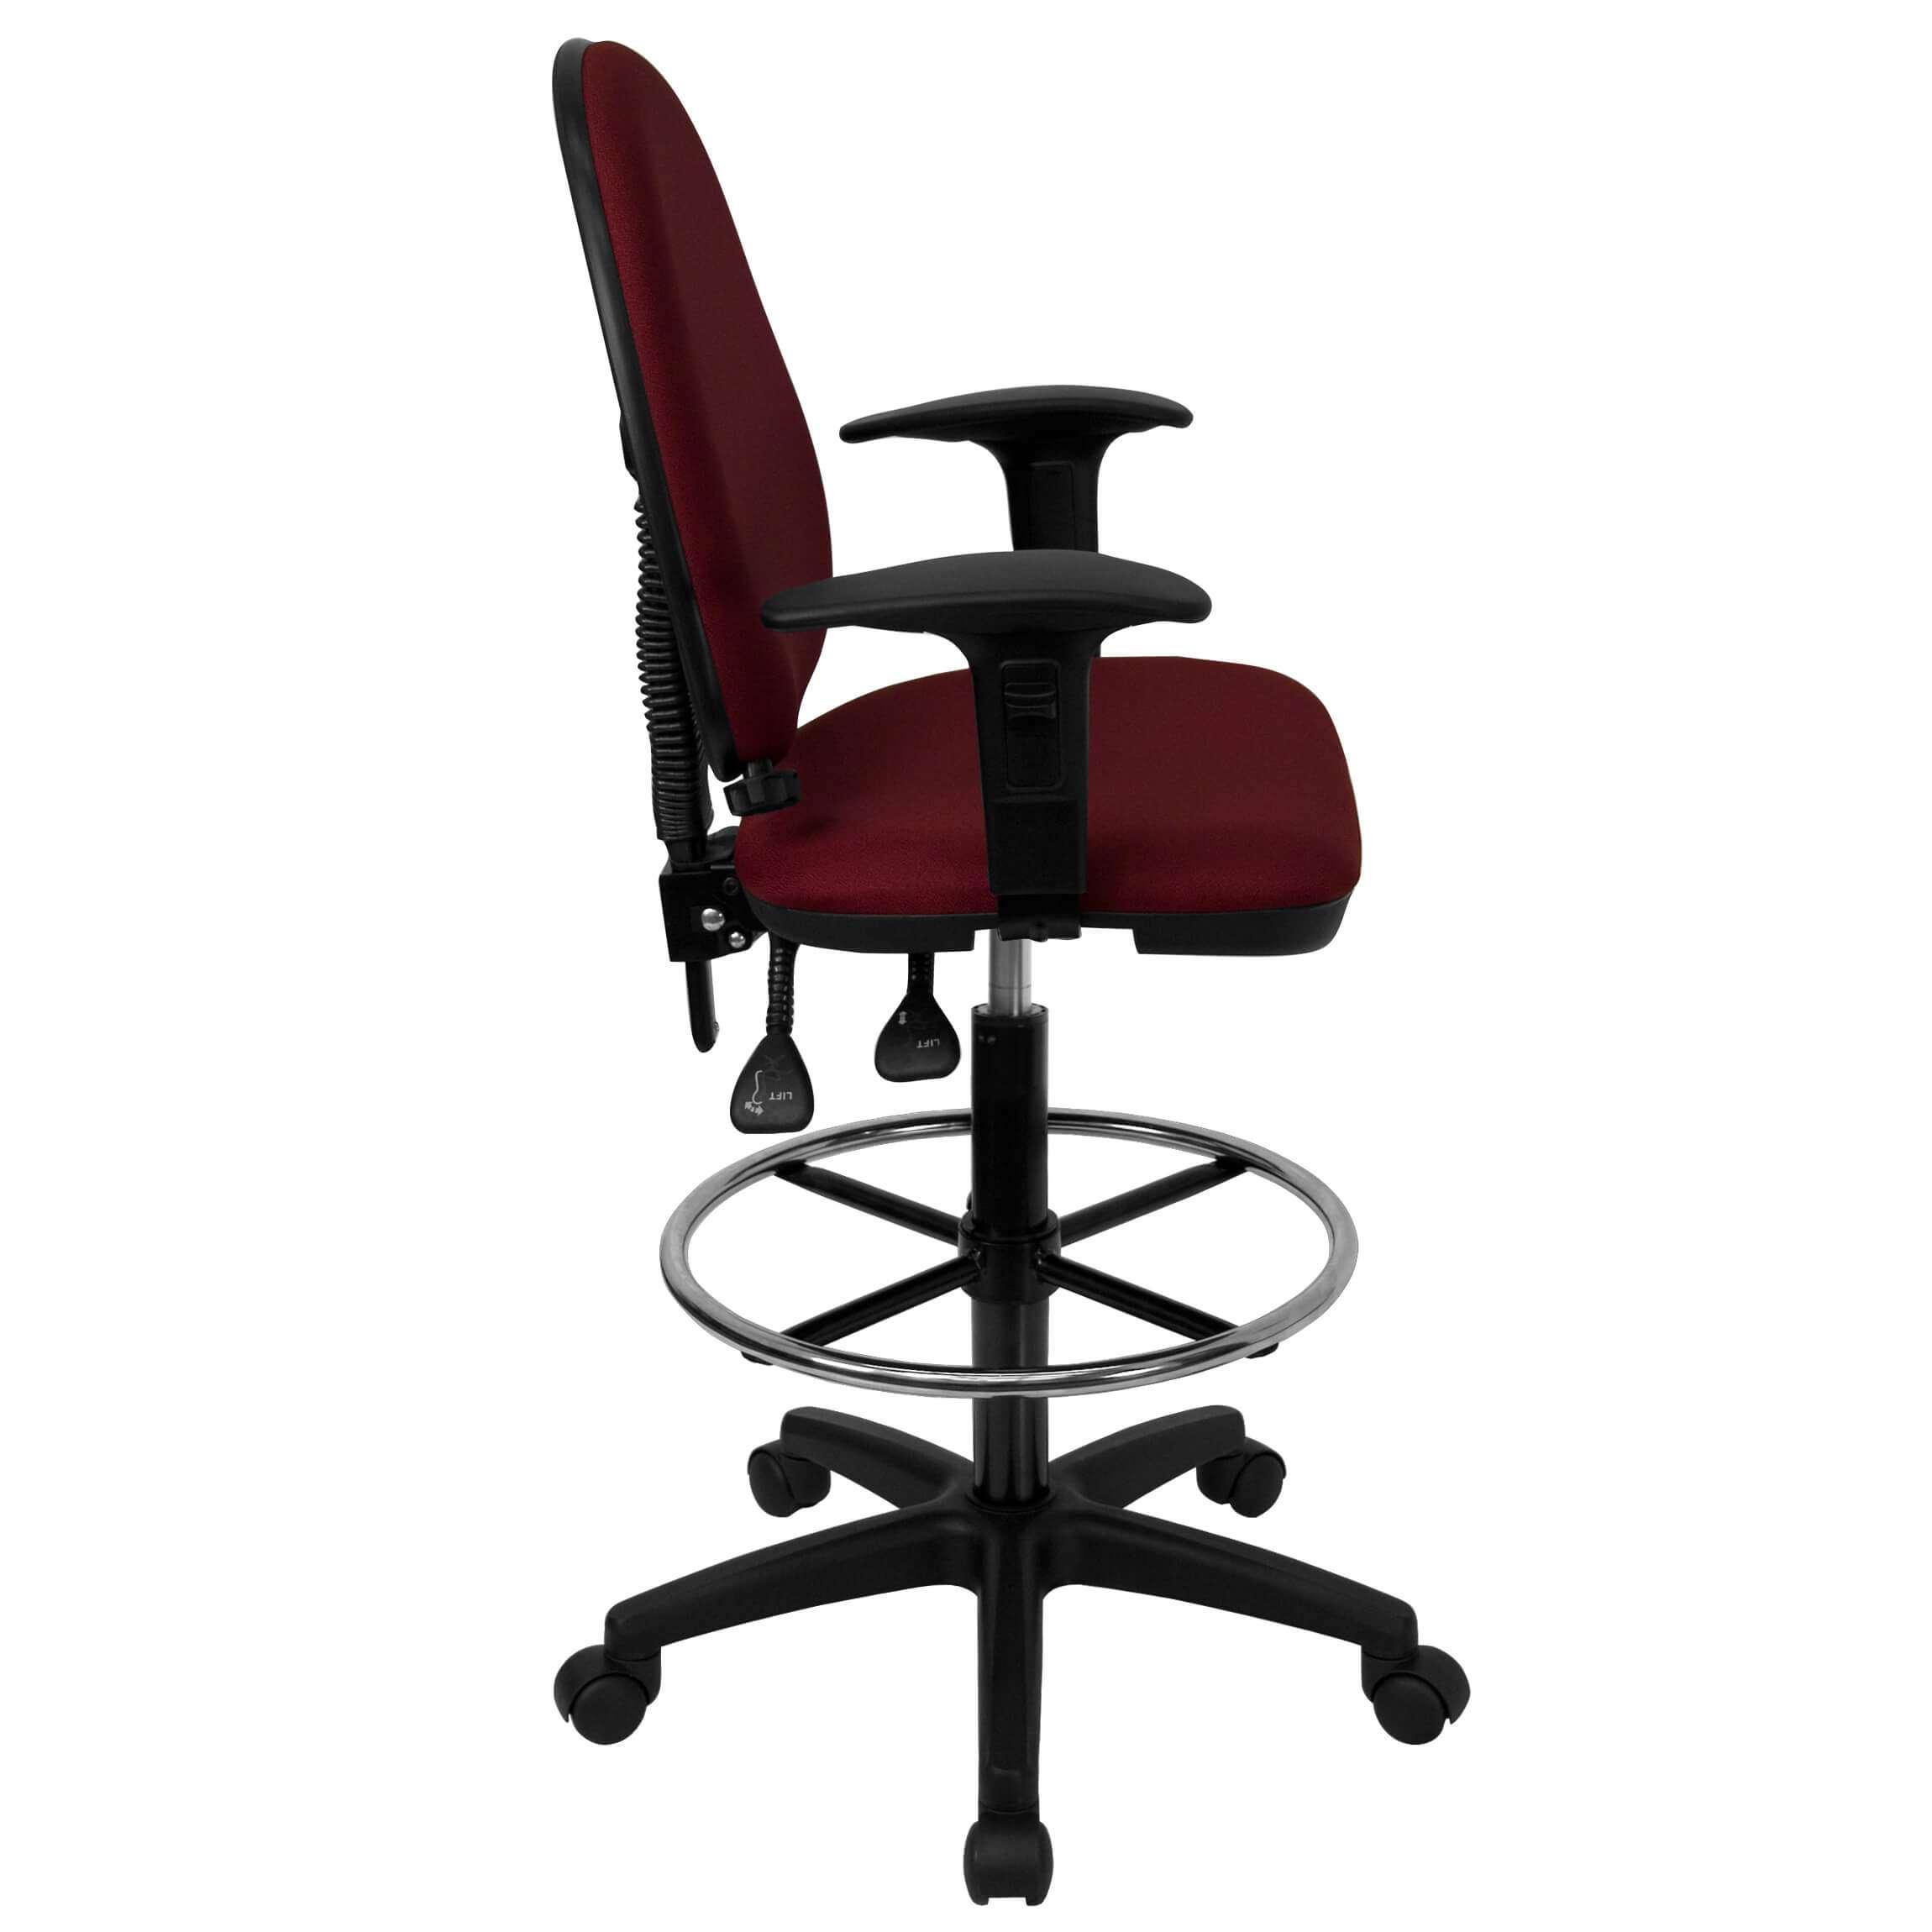 adjustable drafting chair make rocking cushions ursa petite